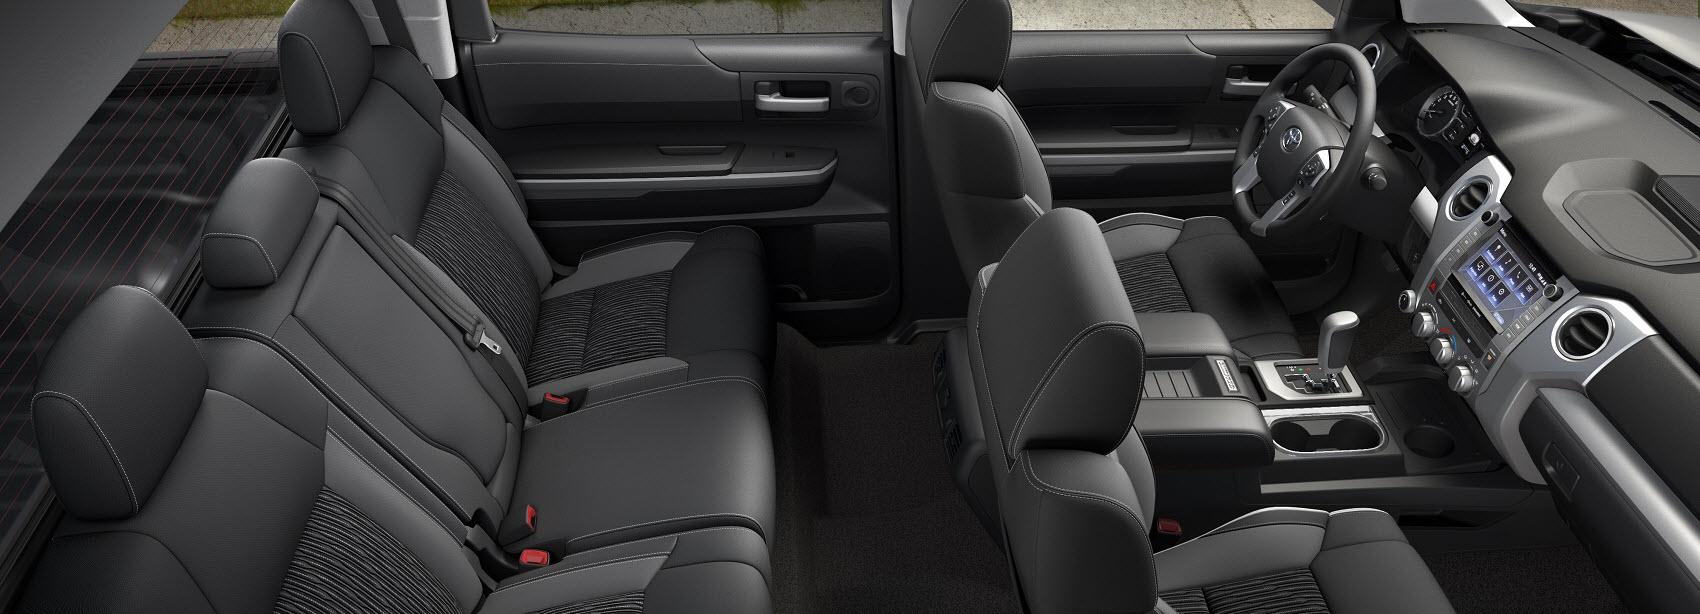 Toyota Tundra Interior Space